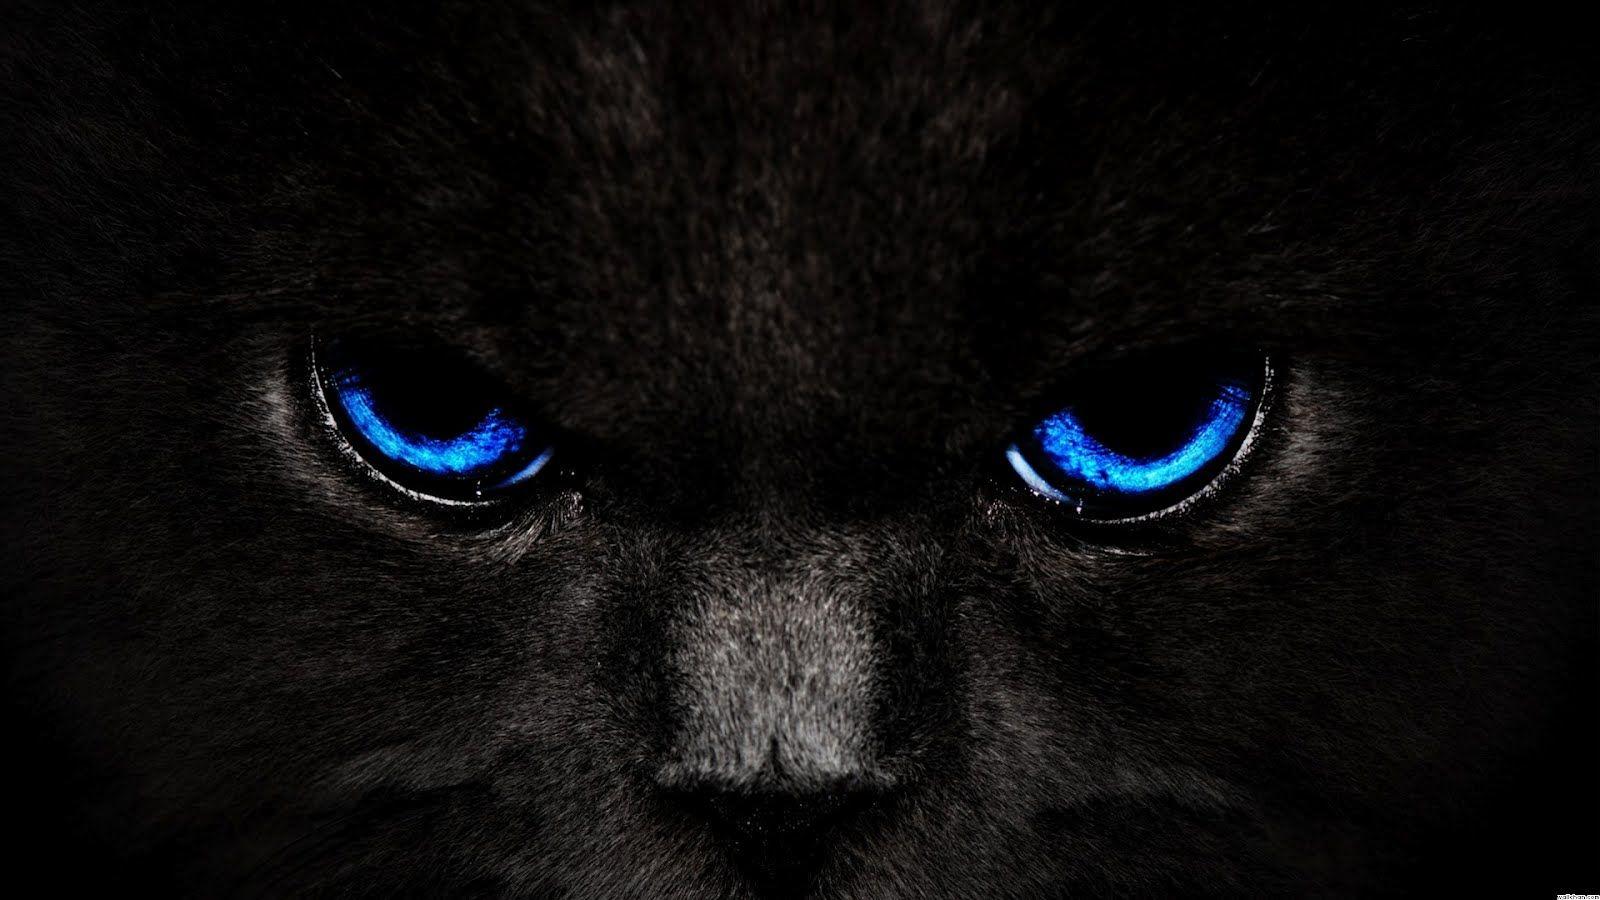 black and blue background wallpaper black cat blue eyes wallpaper